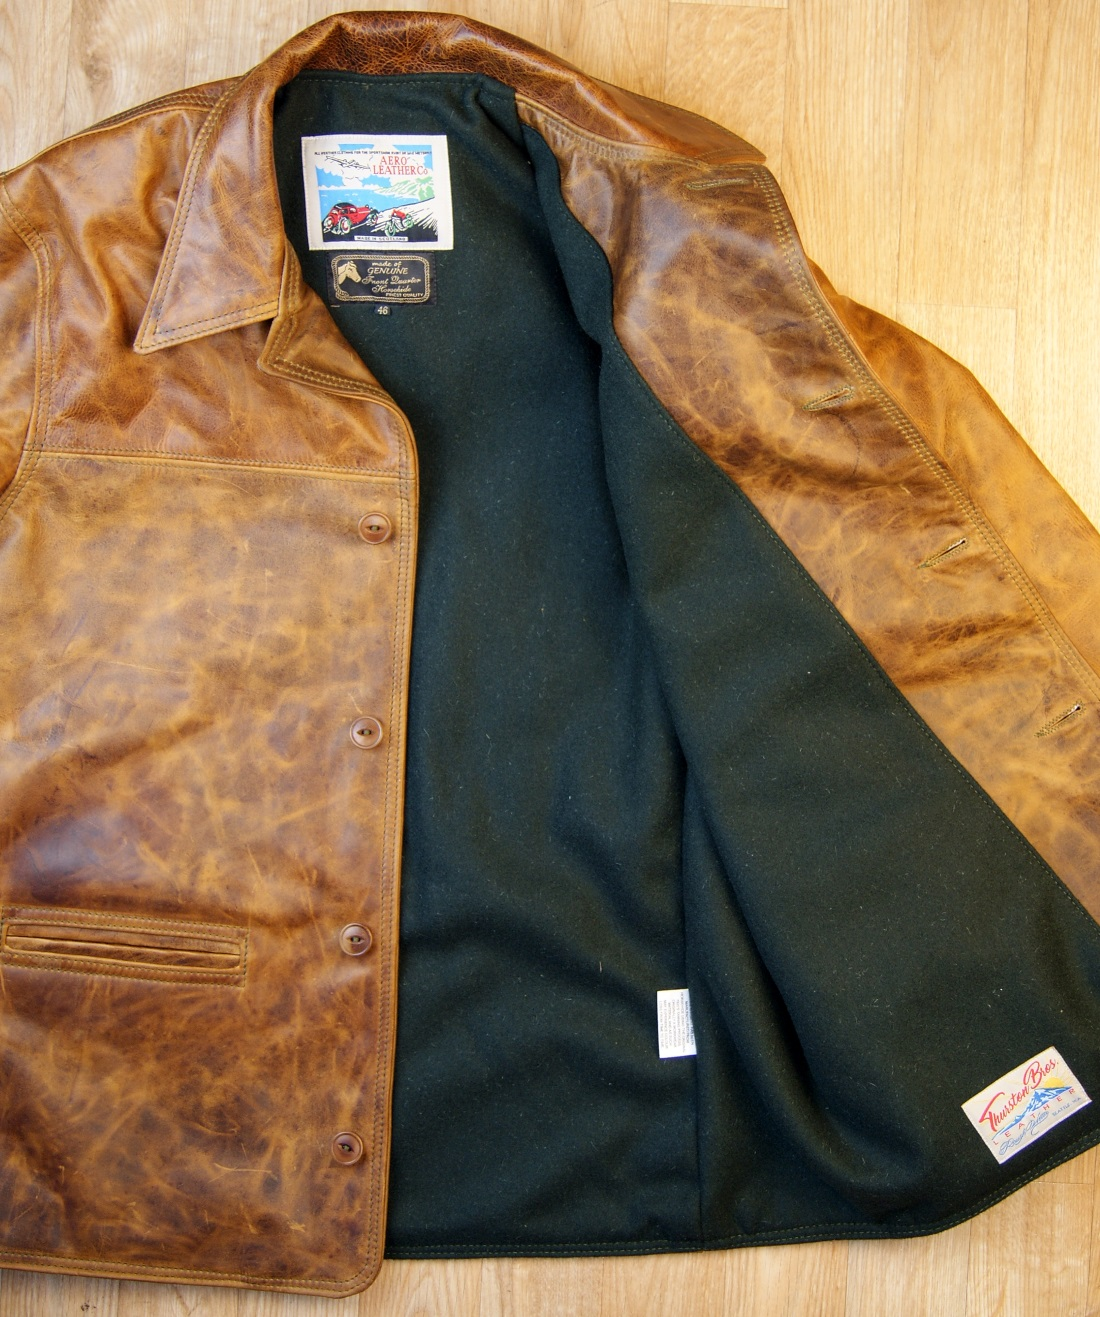 Aero Premier Work Coat Battered Tan Green Melton Wool lining.jpg